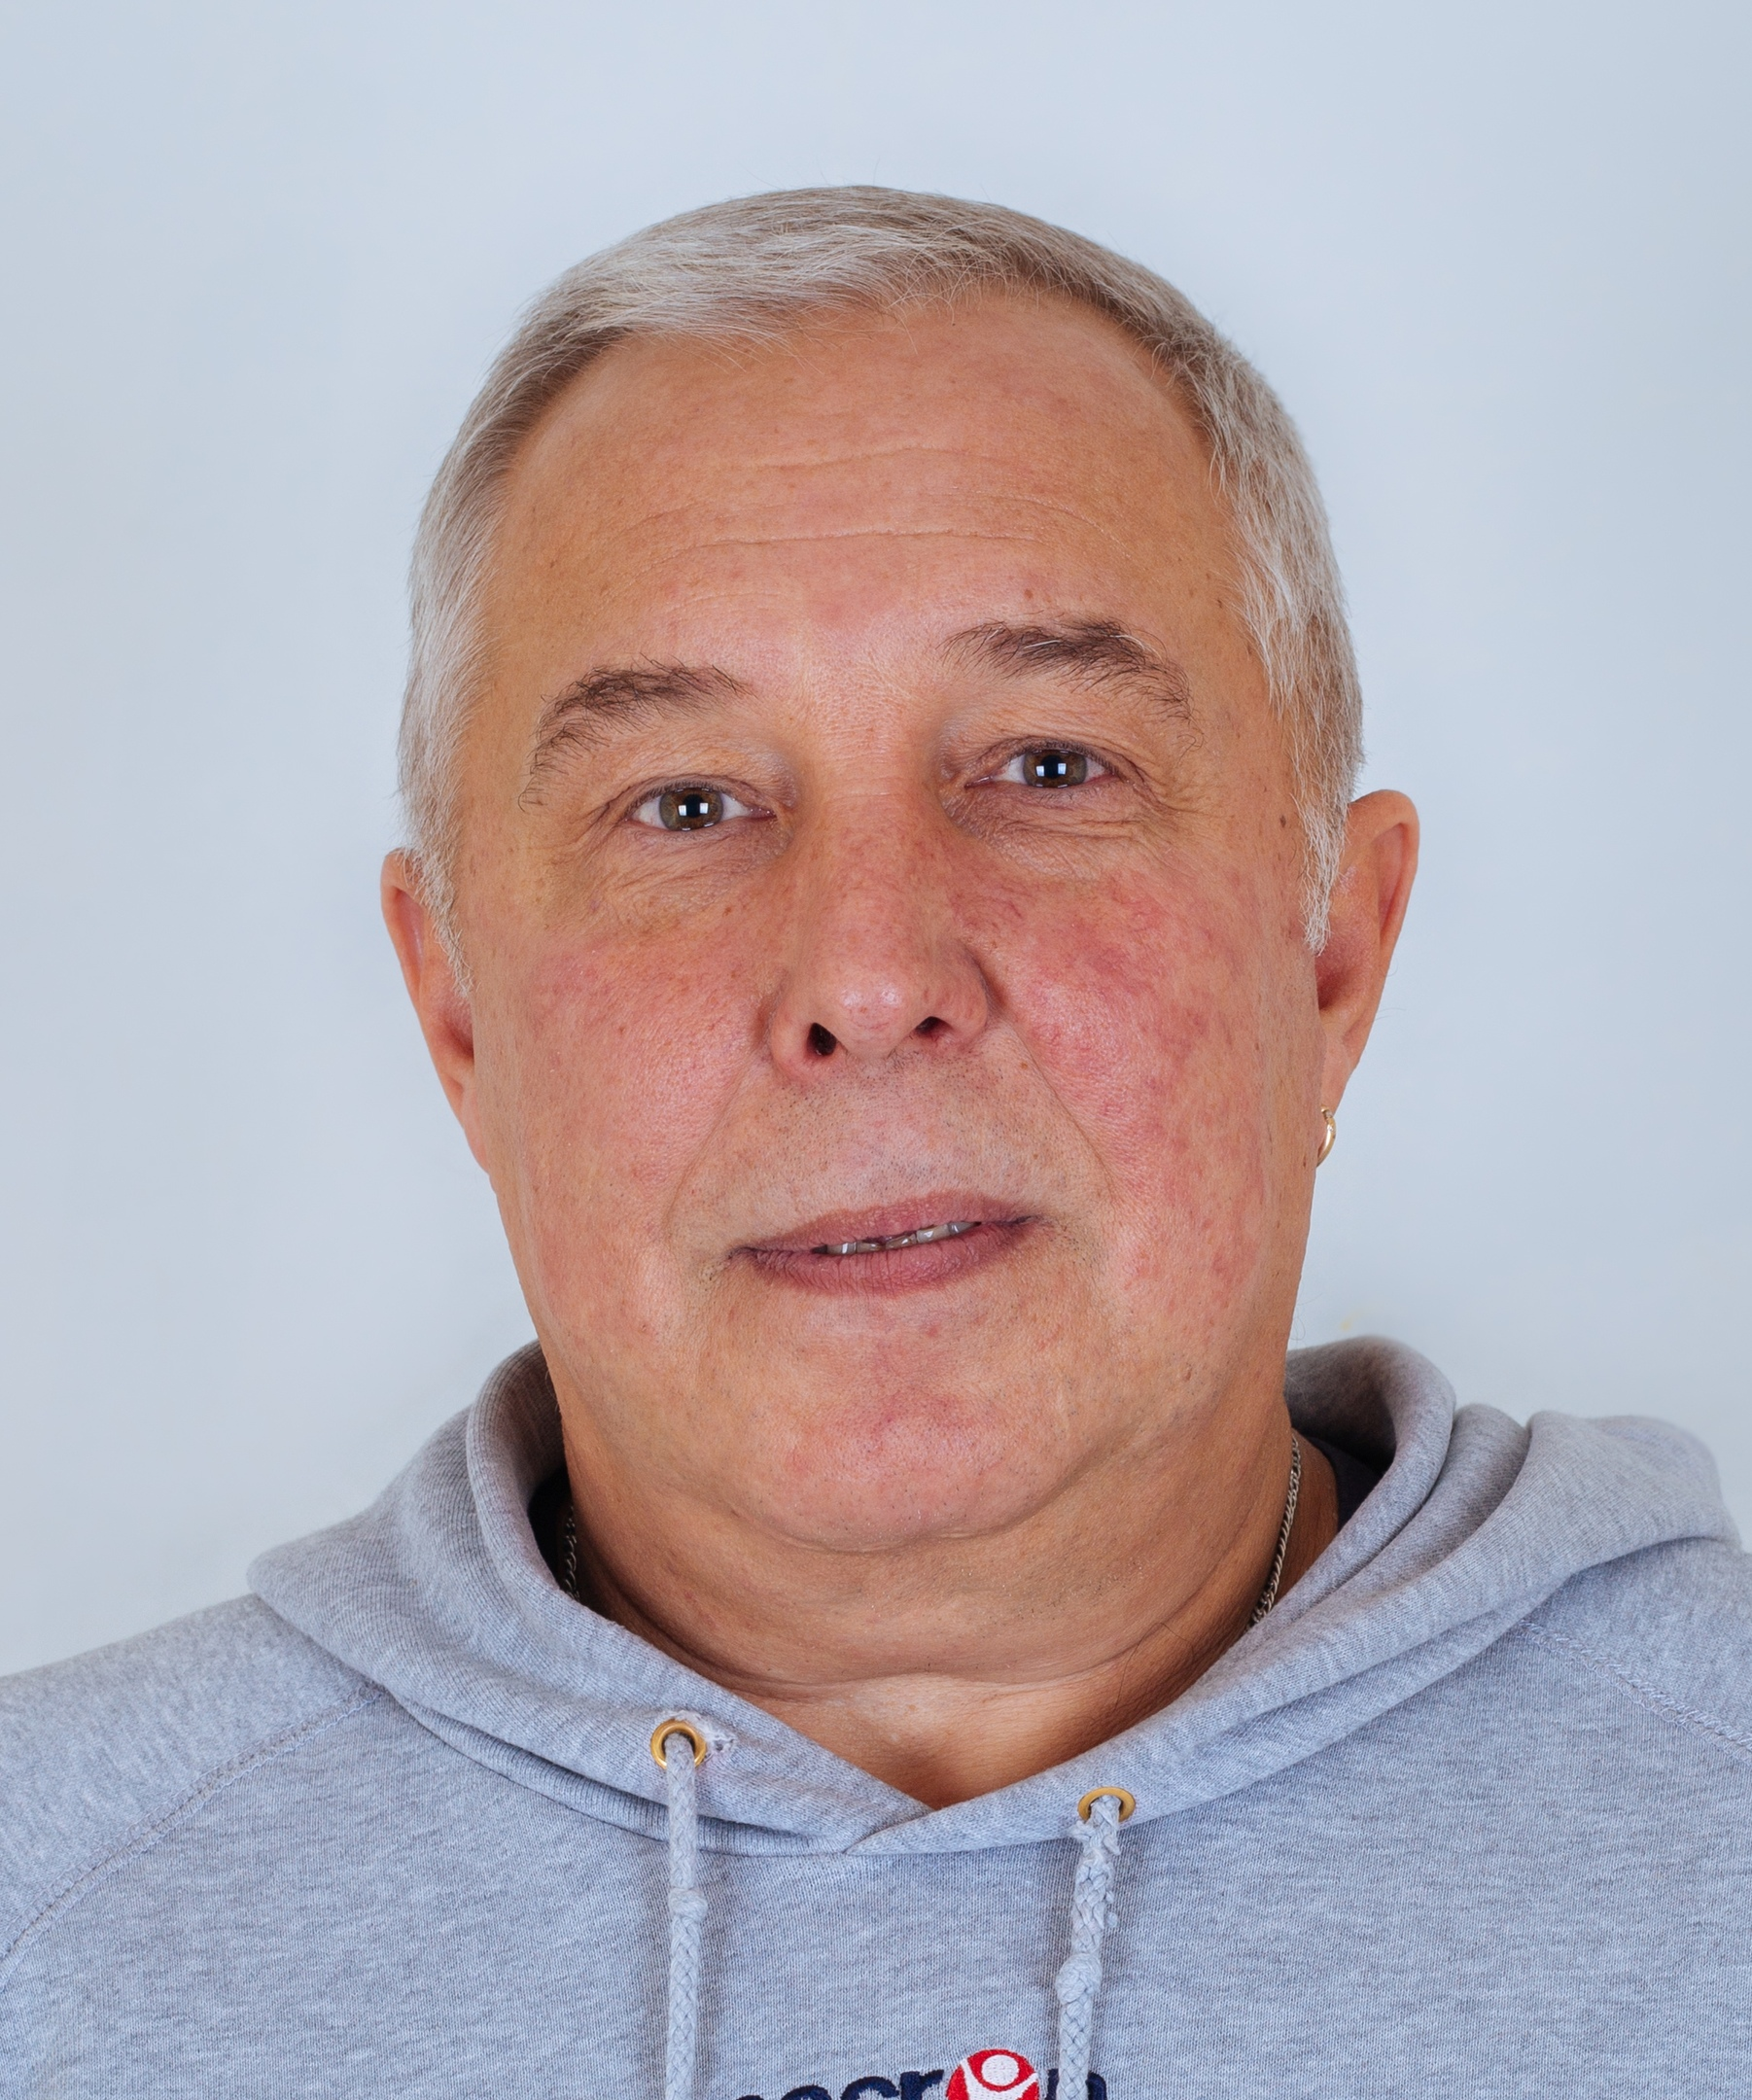 Ивченко Игорь Петрович